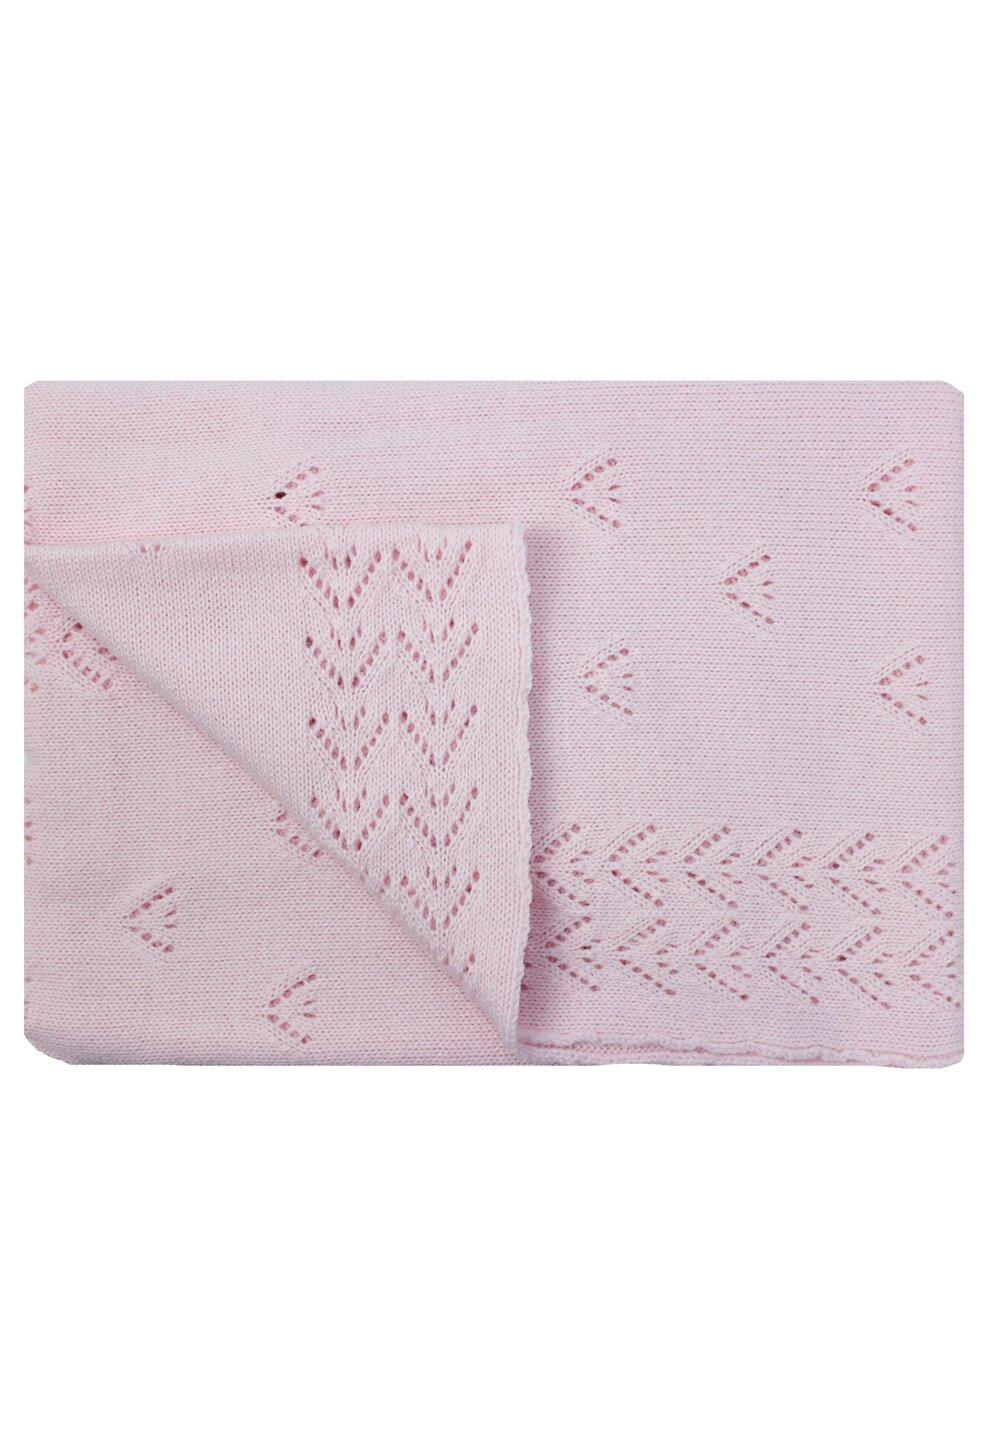 Paturica tricotata, Ana, roz, 90x90cm imagine